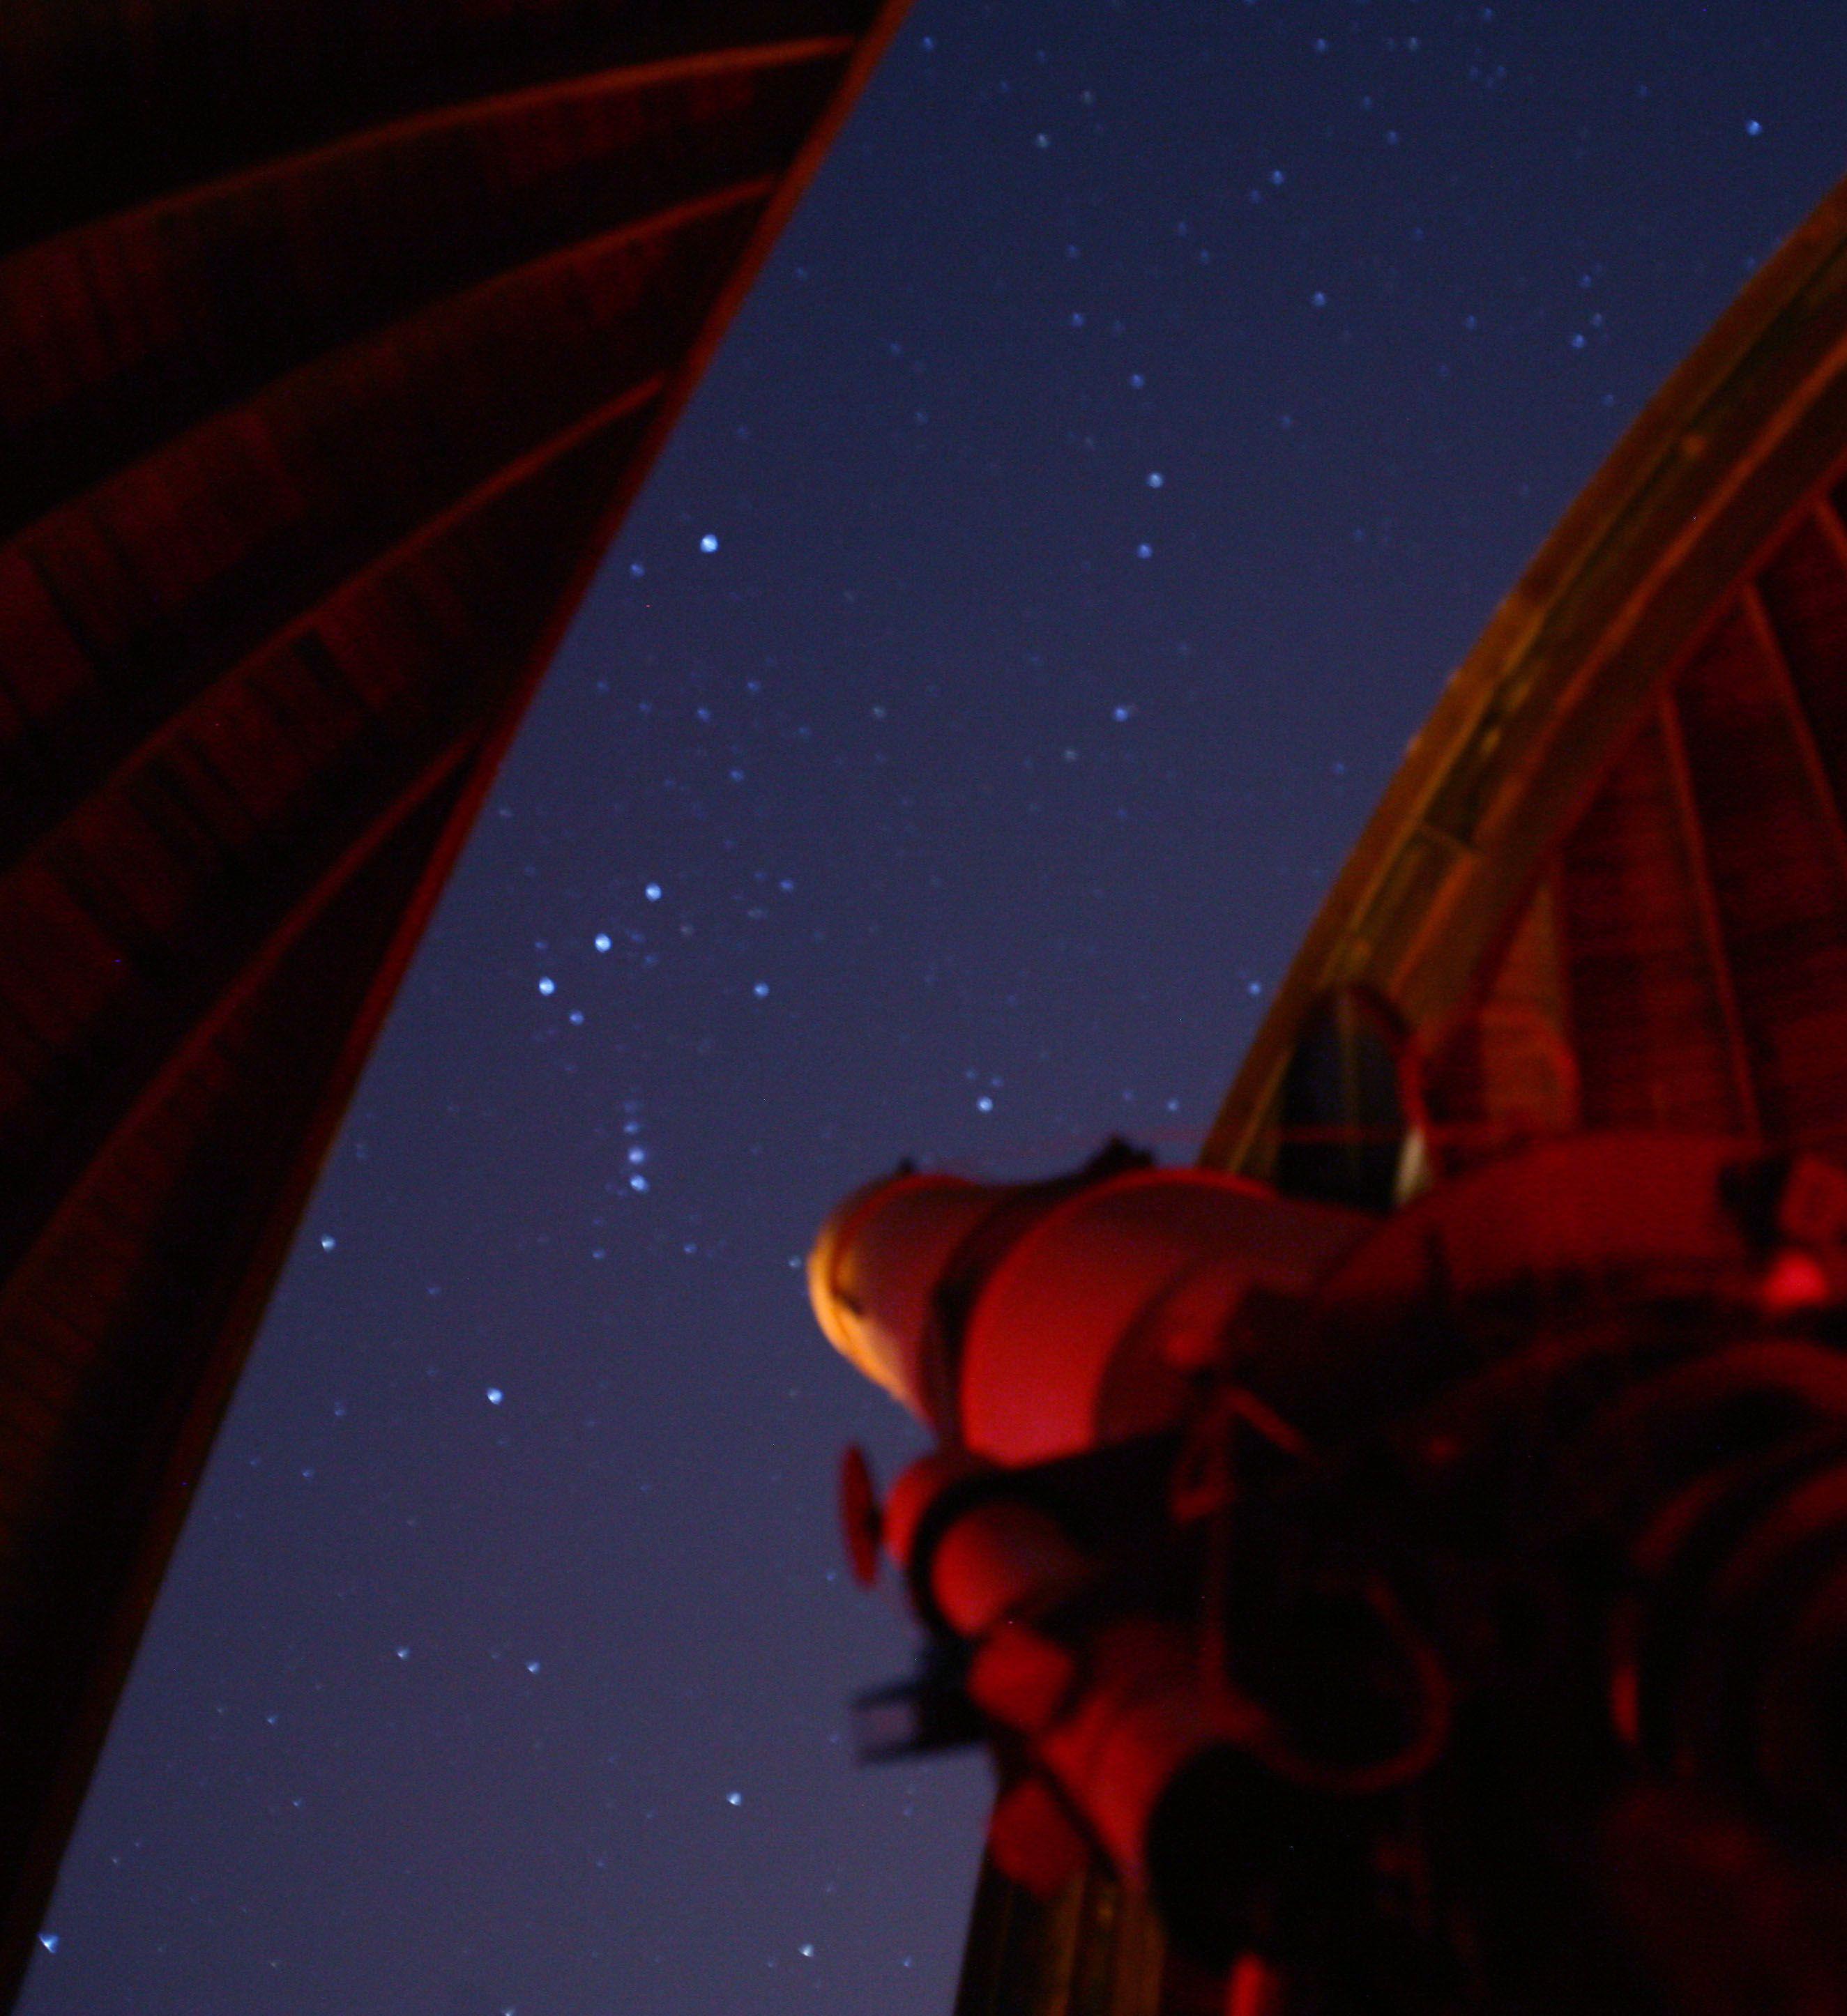 Orion captured through the slit of the Visuale telescope at Castel Gandolfo. Credit: Alfredo Matacotta